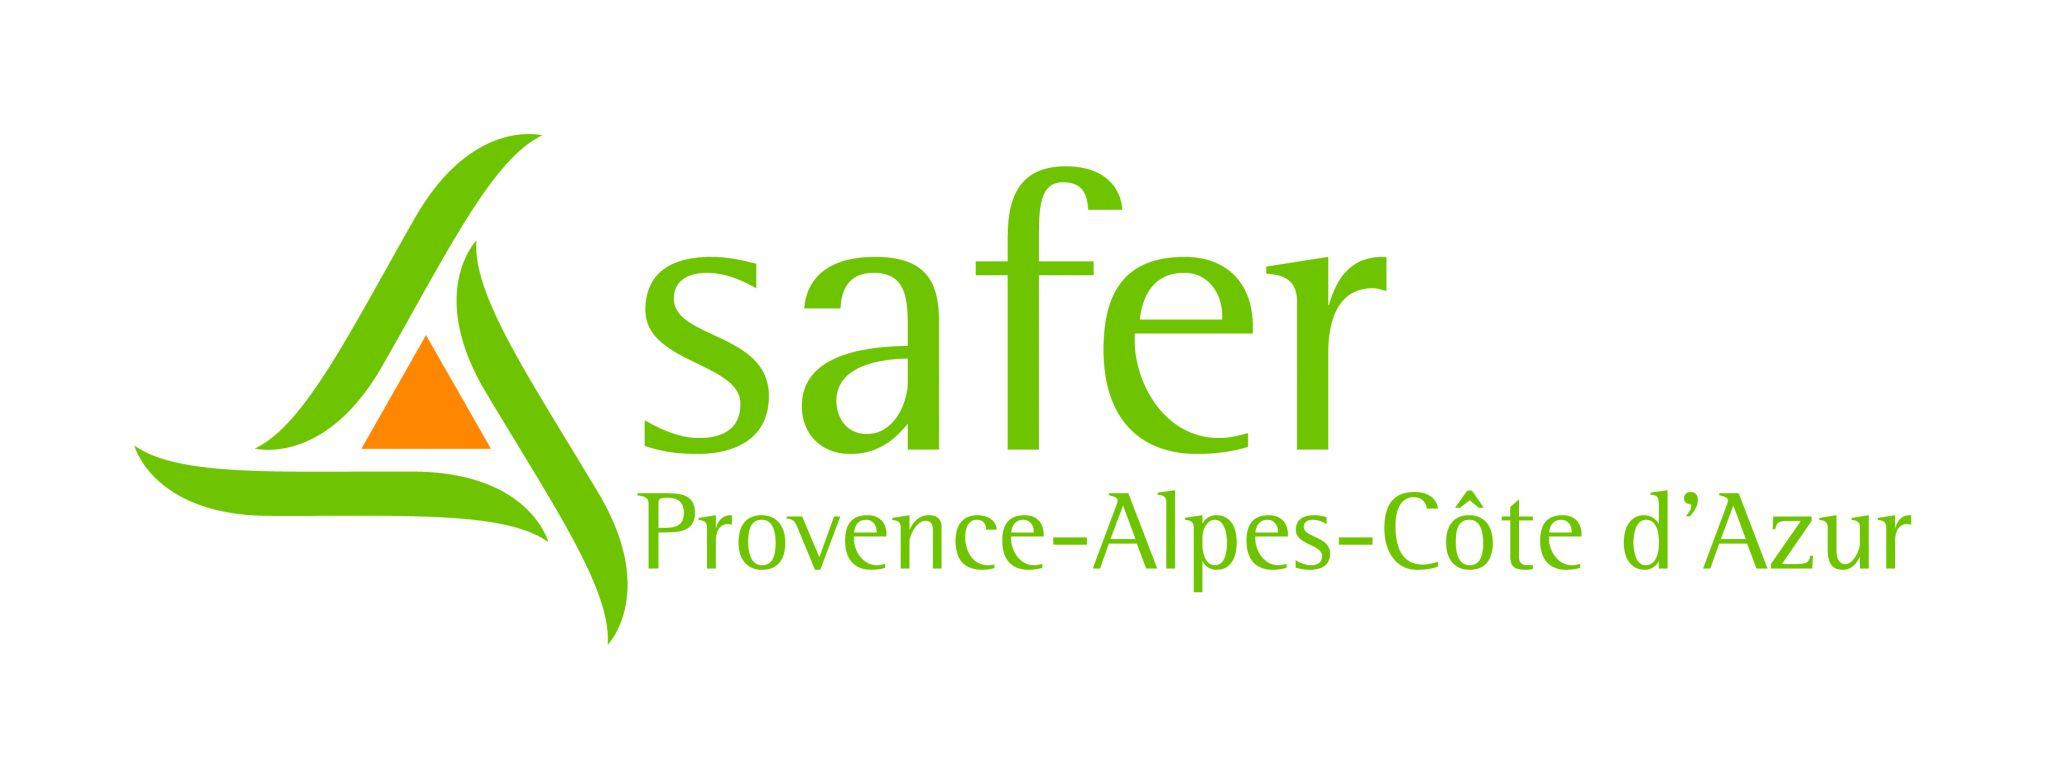 Safer